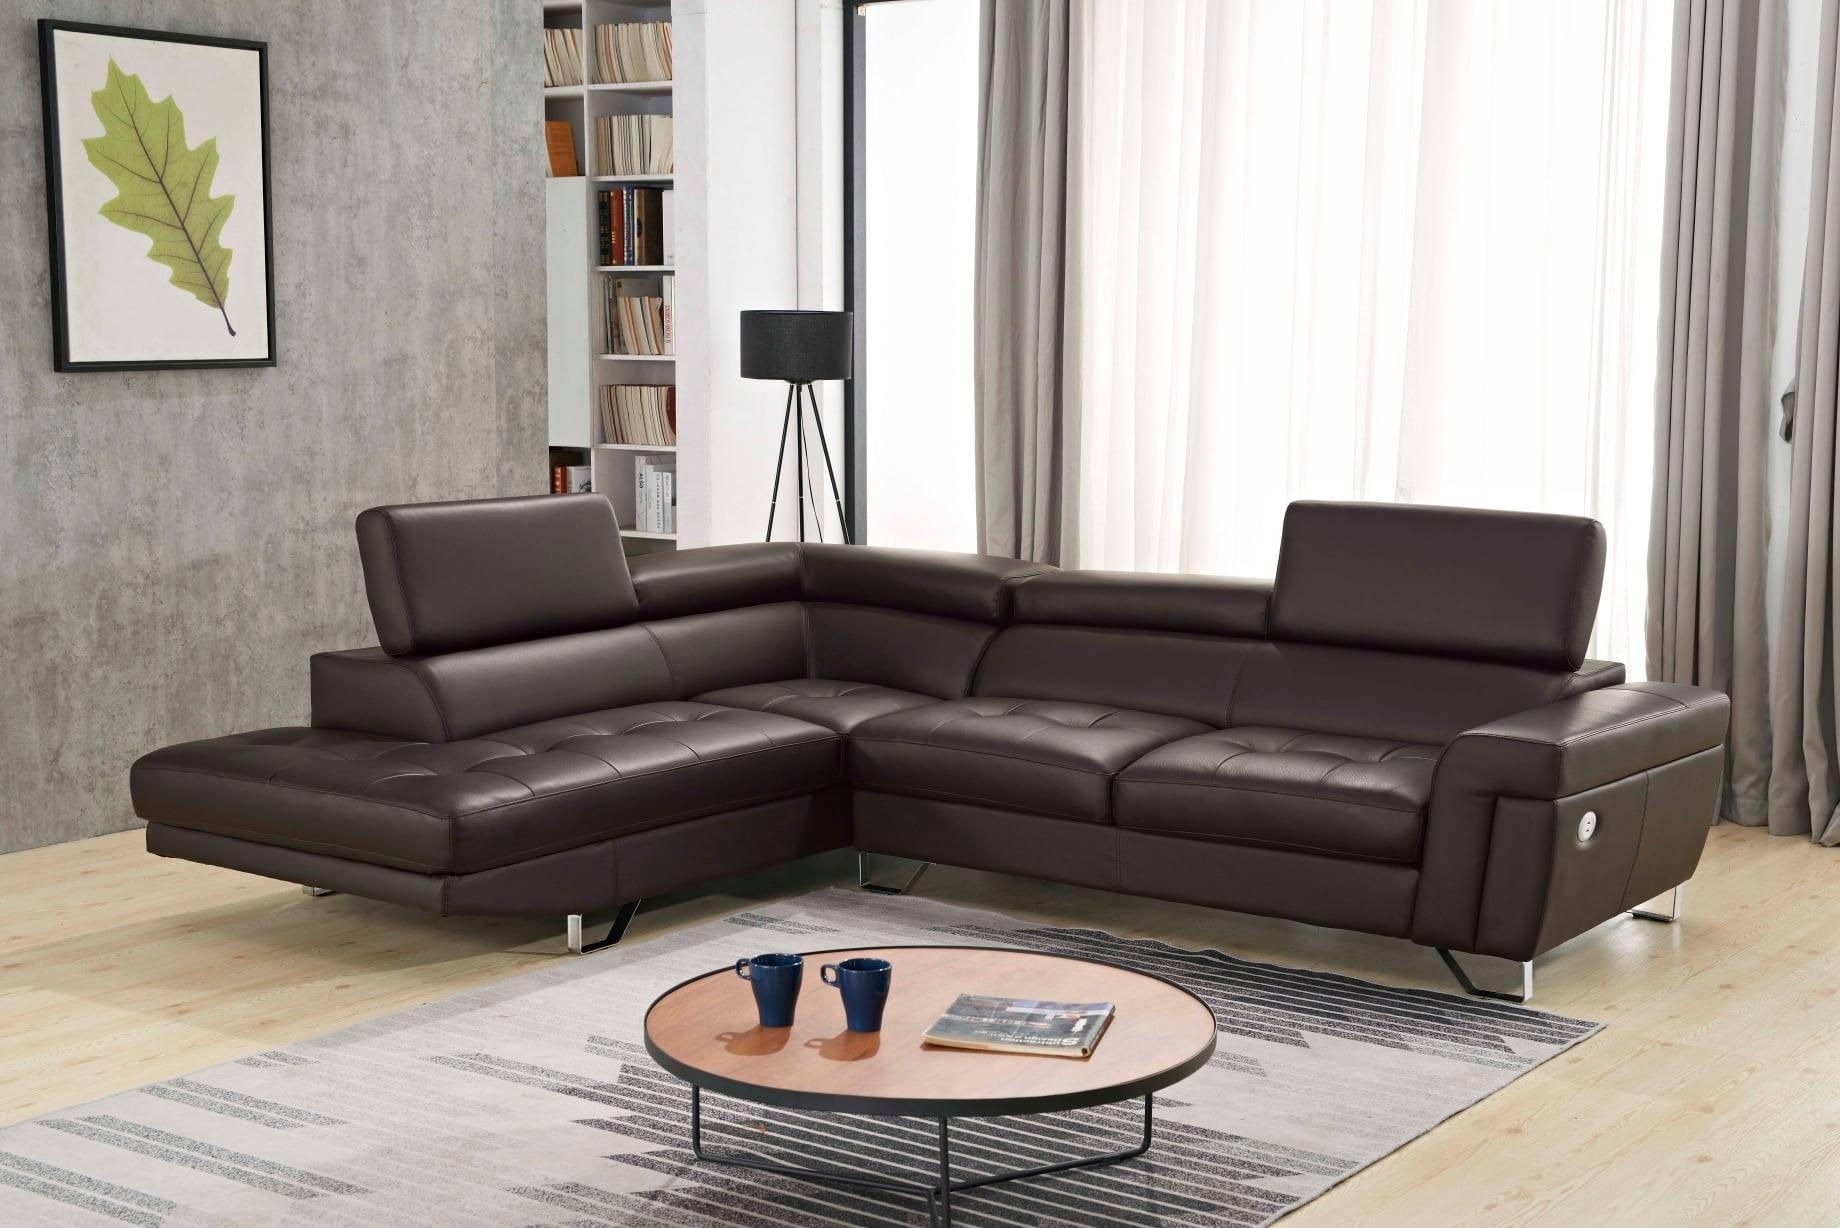 Chicago L-Shape Leather Sofa